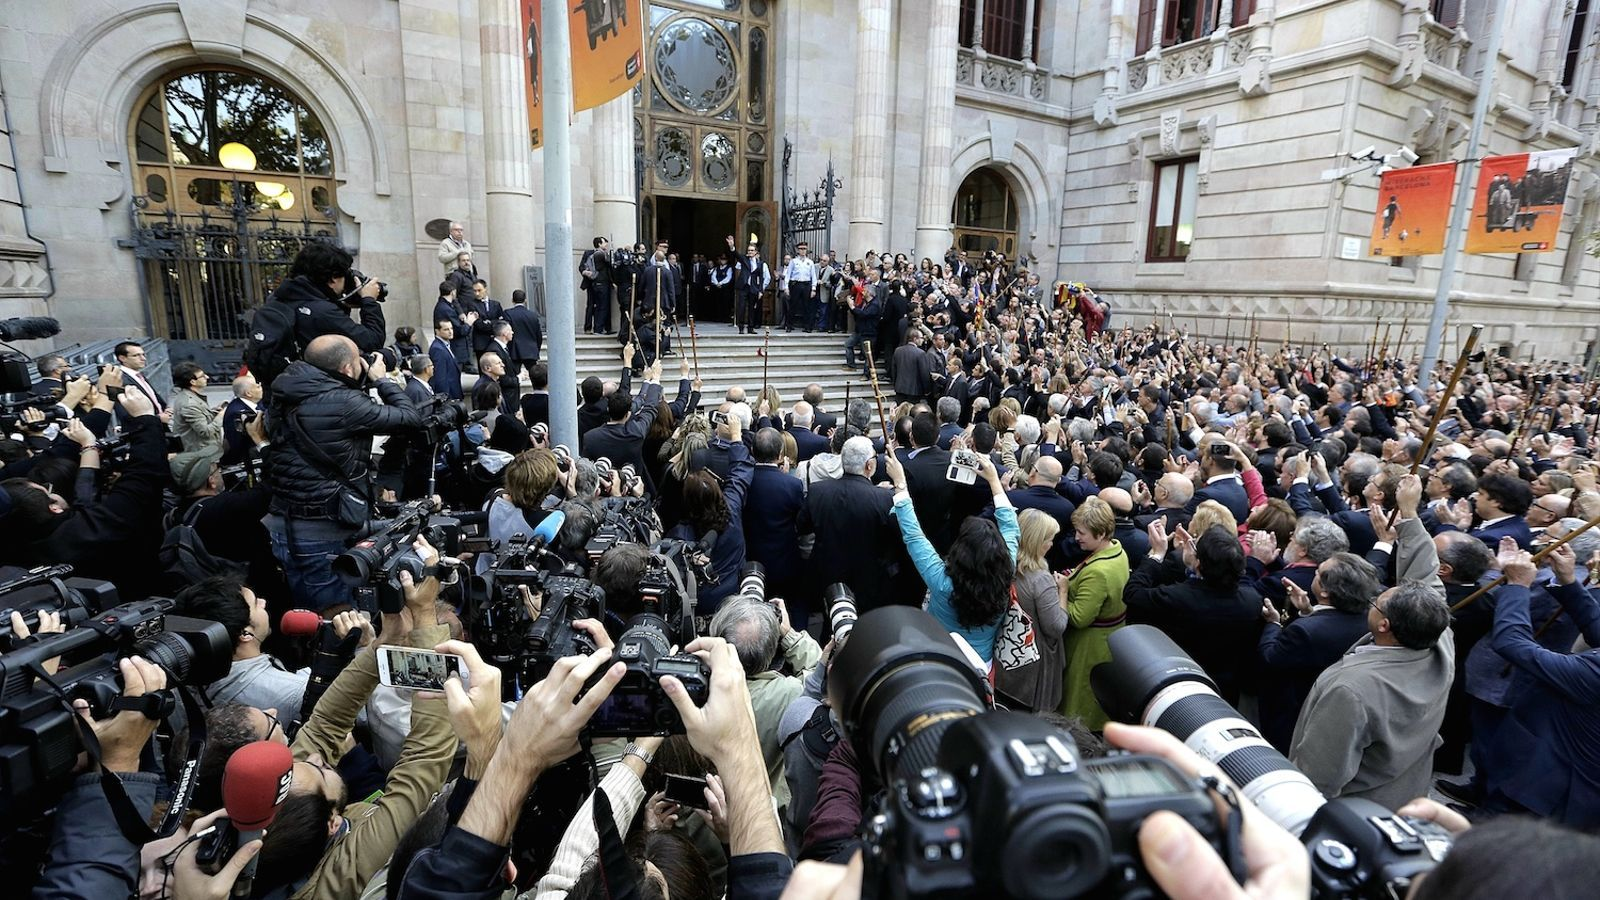 La multitud que esperava Mas davant del TSJC, ciutadans i periodistes. El president saluda des de les escales / MANOLO GARCÍA